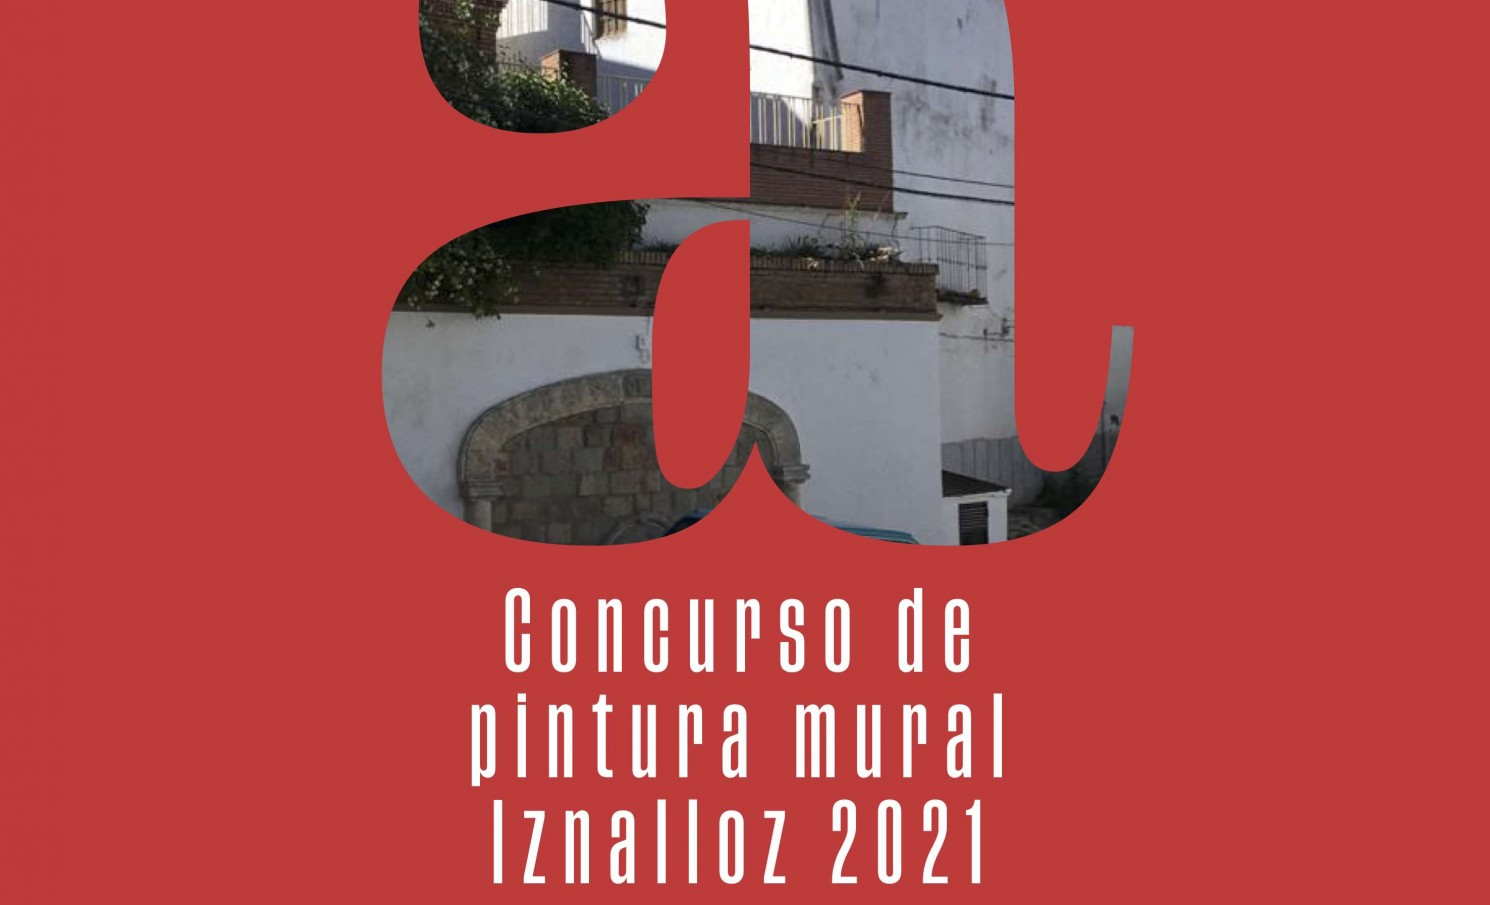 I Concurso de pintura mural de Iznalloz